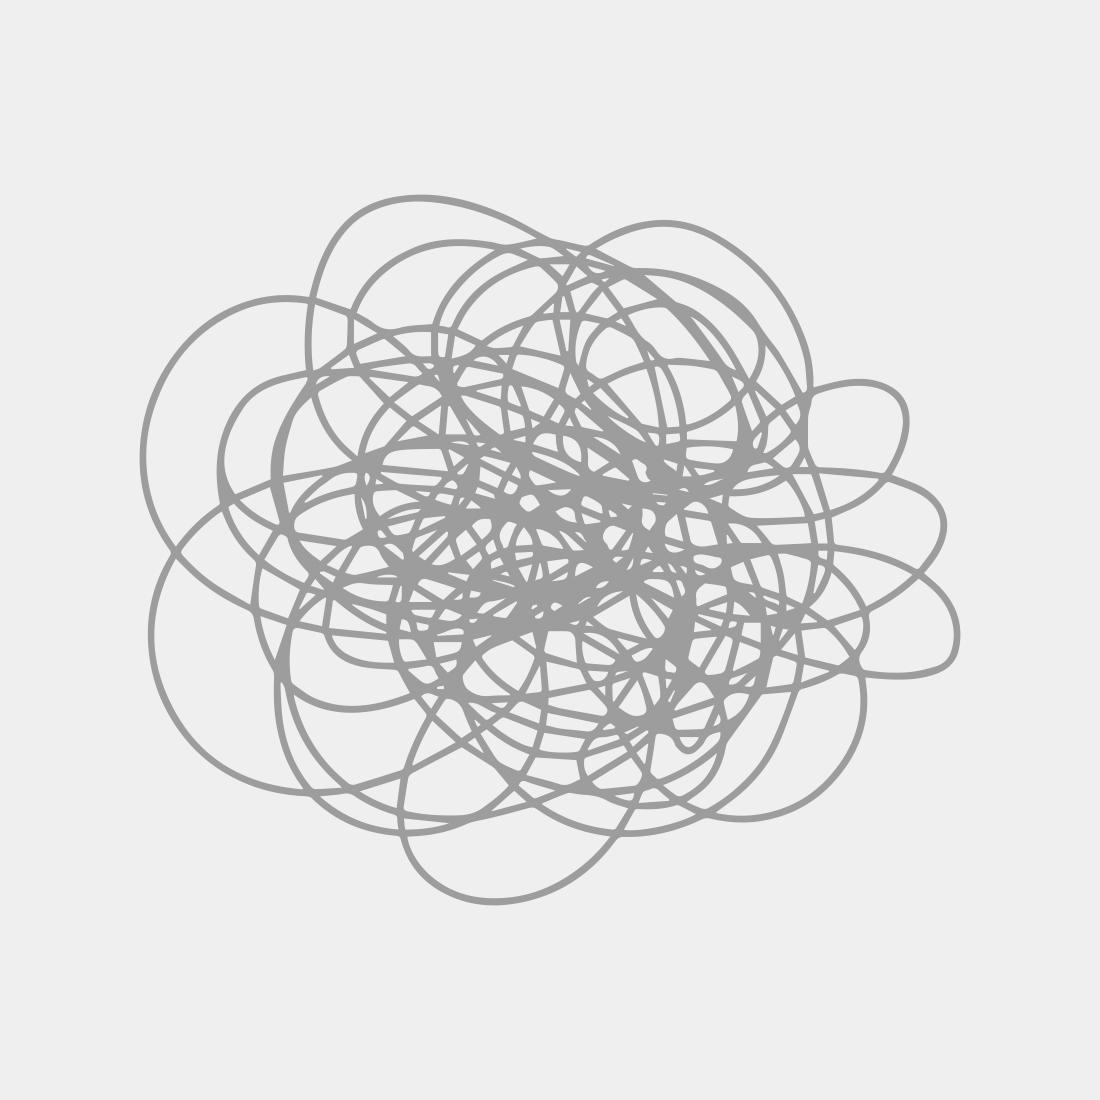 David Mach 'Monarch' Greetings Card